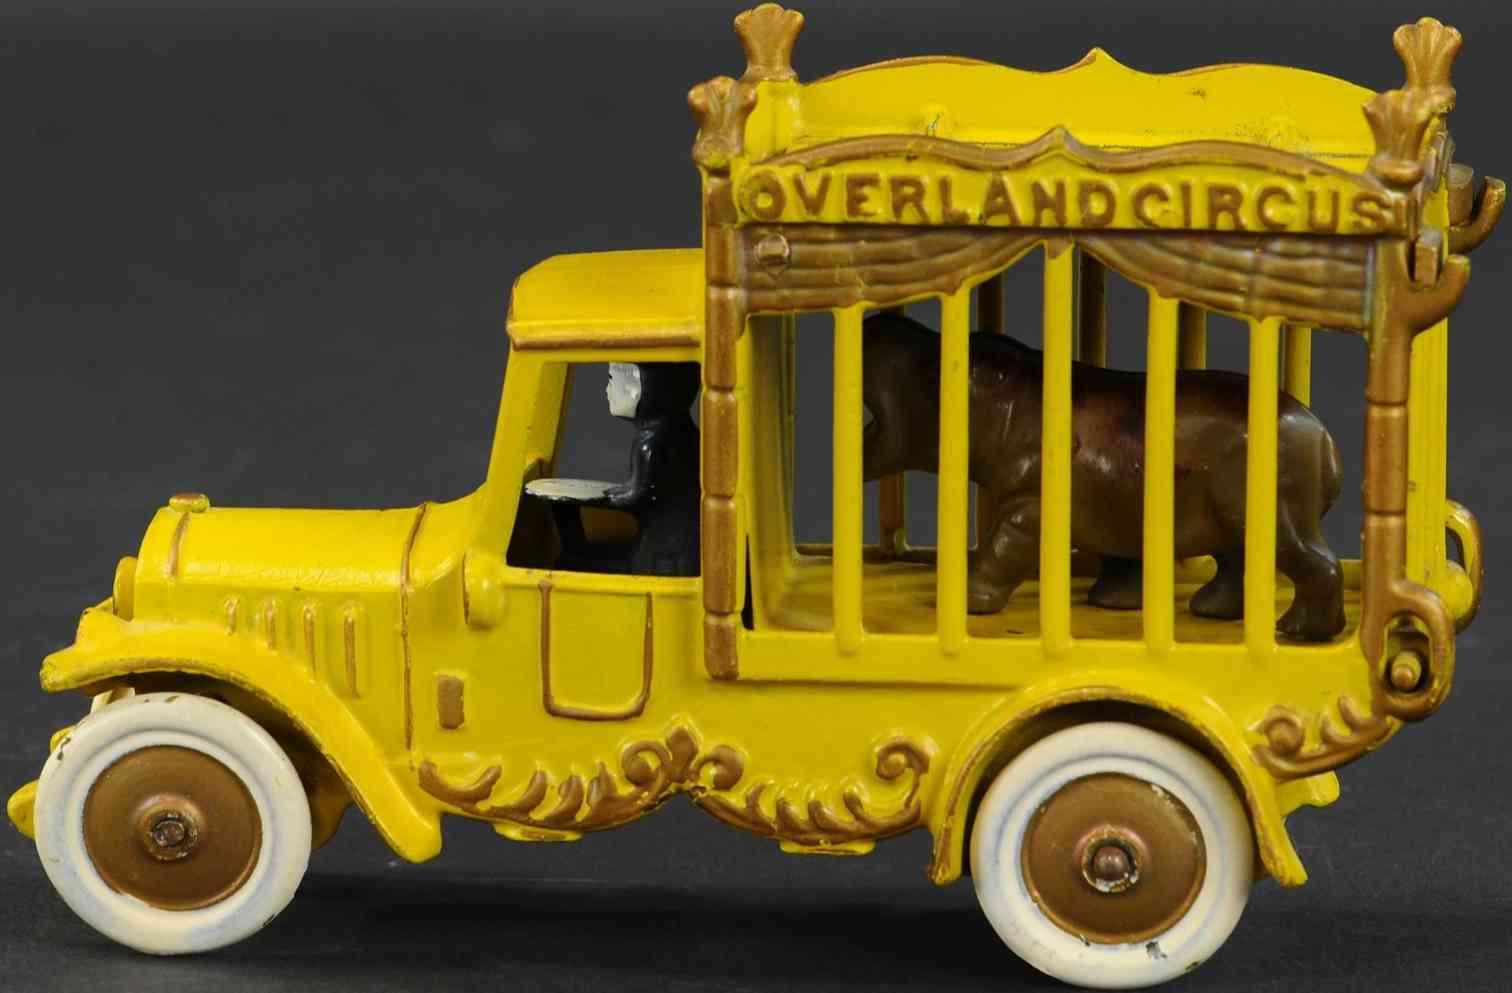 kenton hardware co cast iron toy overland circus cage truck yellow hippopotamus